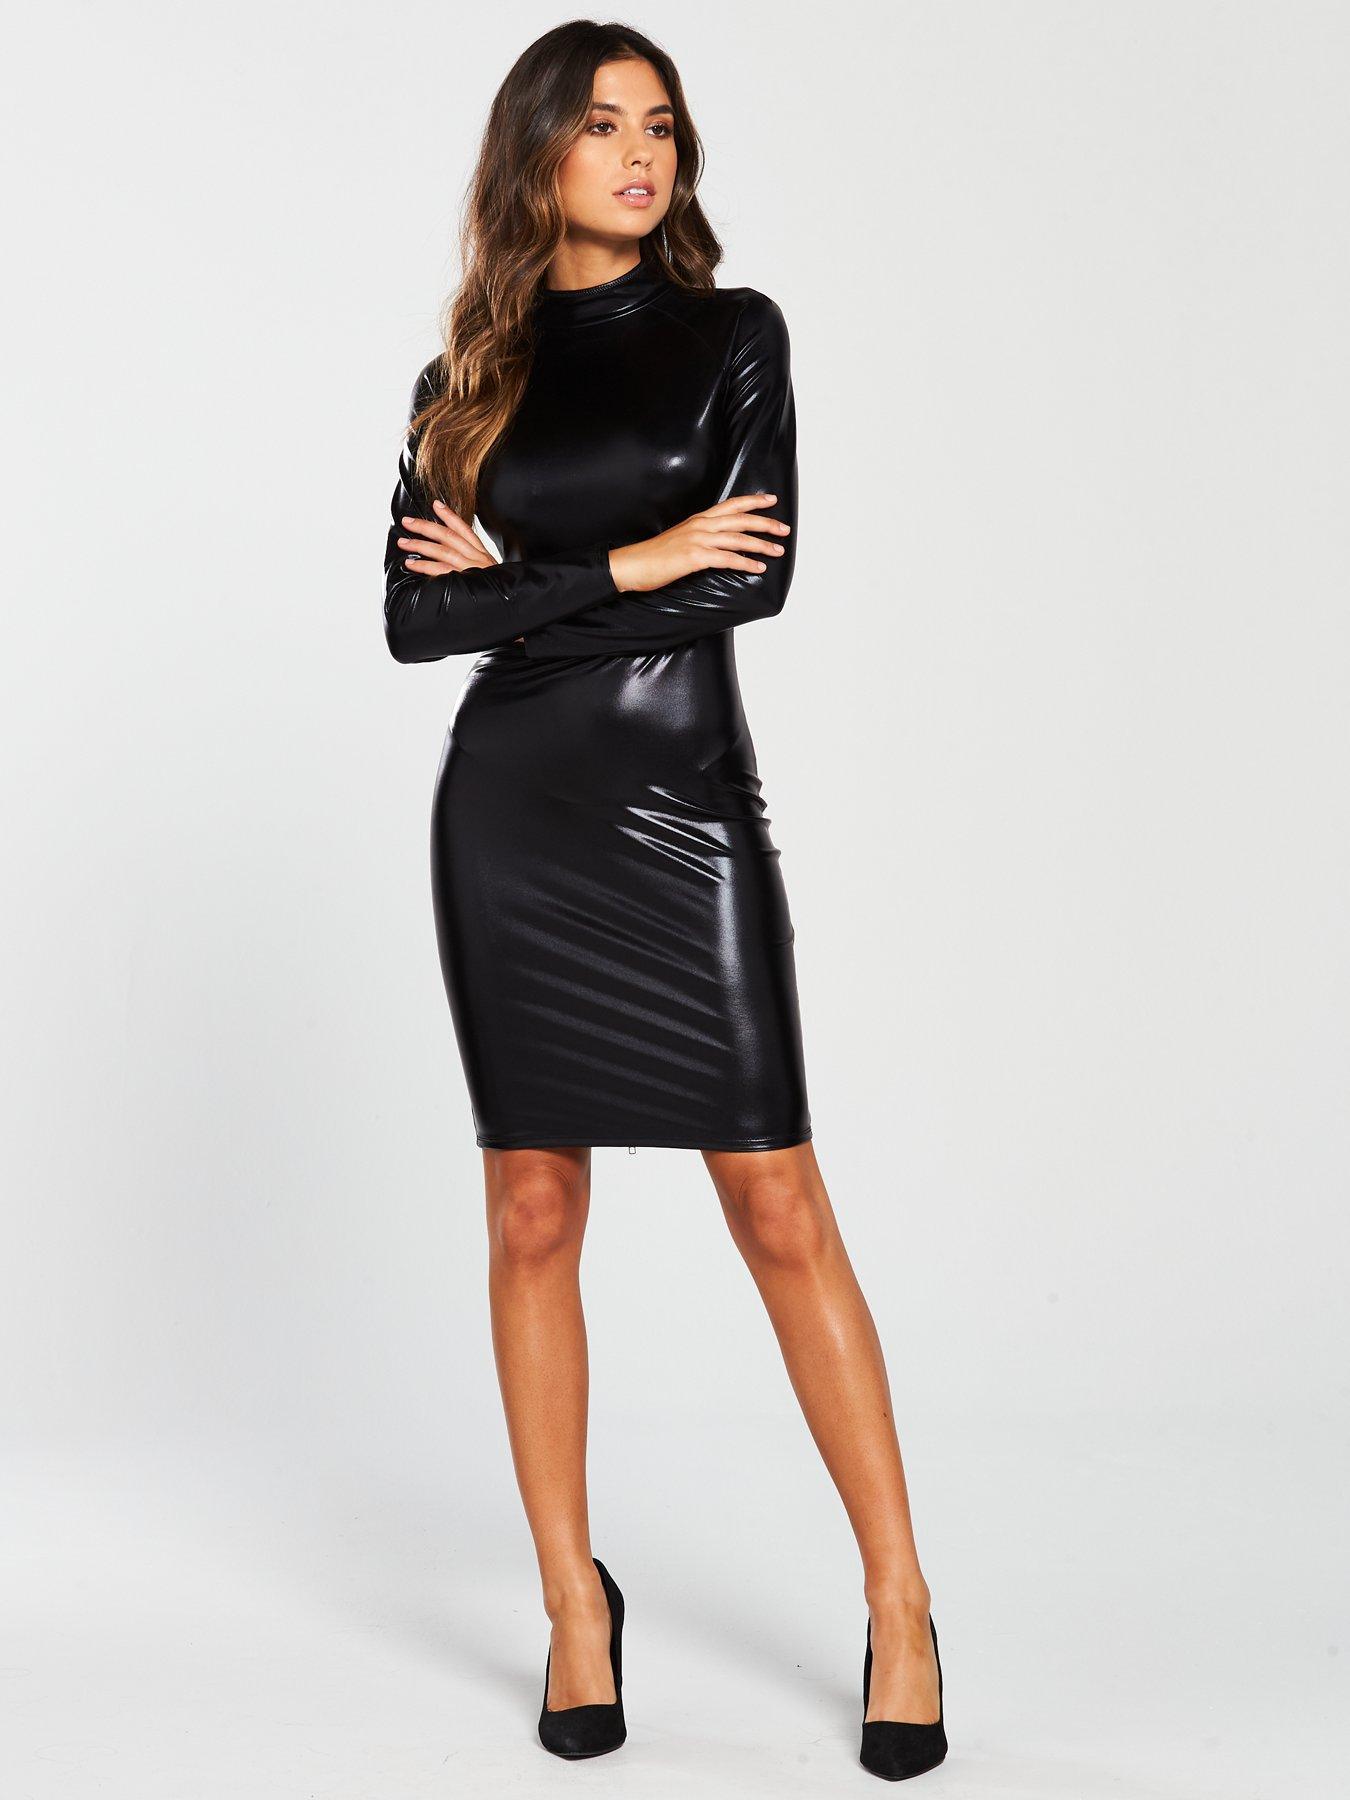 Dresses | All Styles & Sizes | Littlewoods Ireland